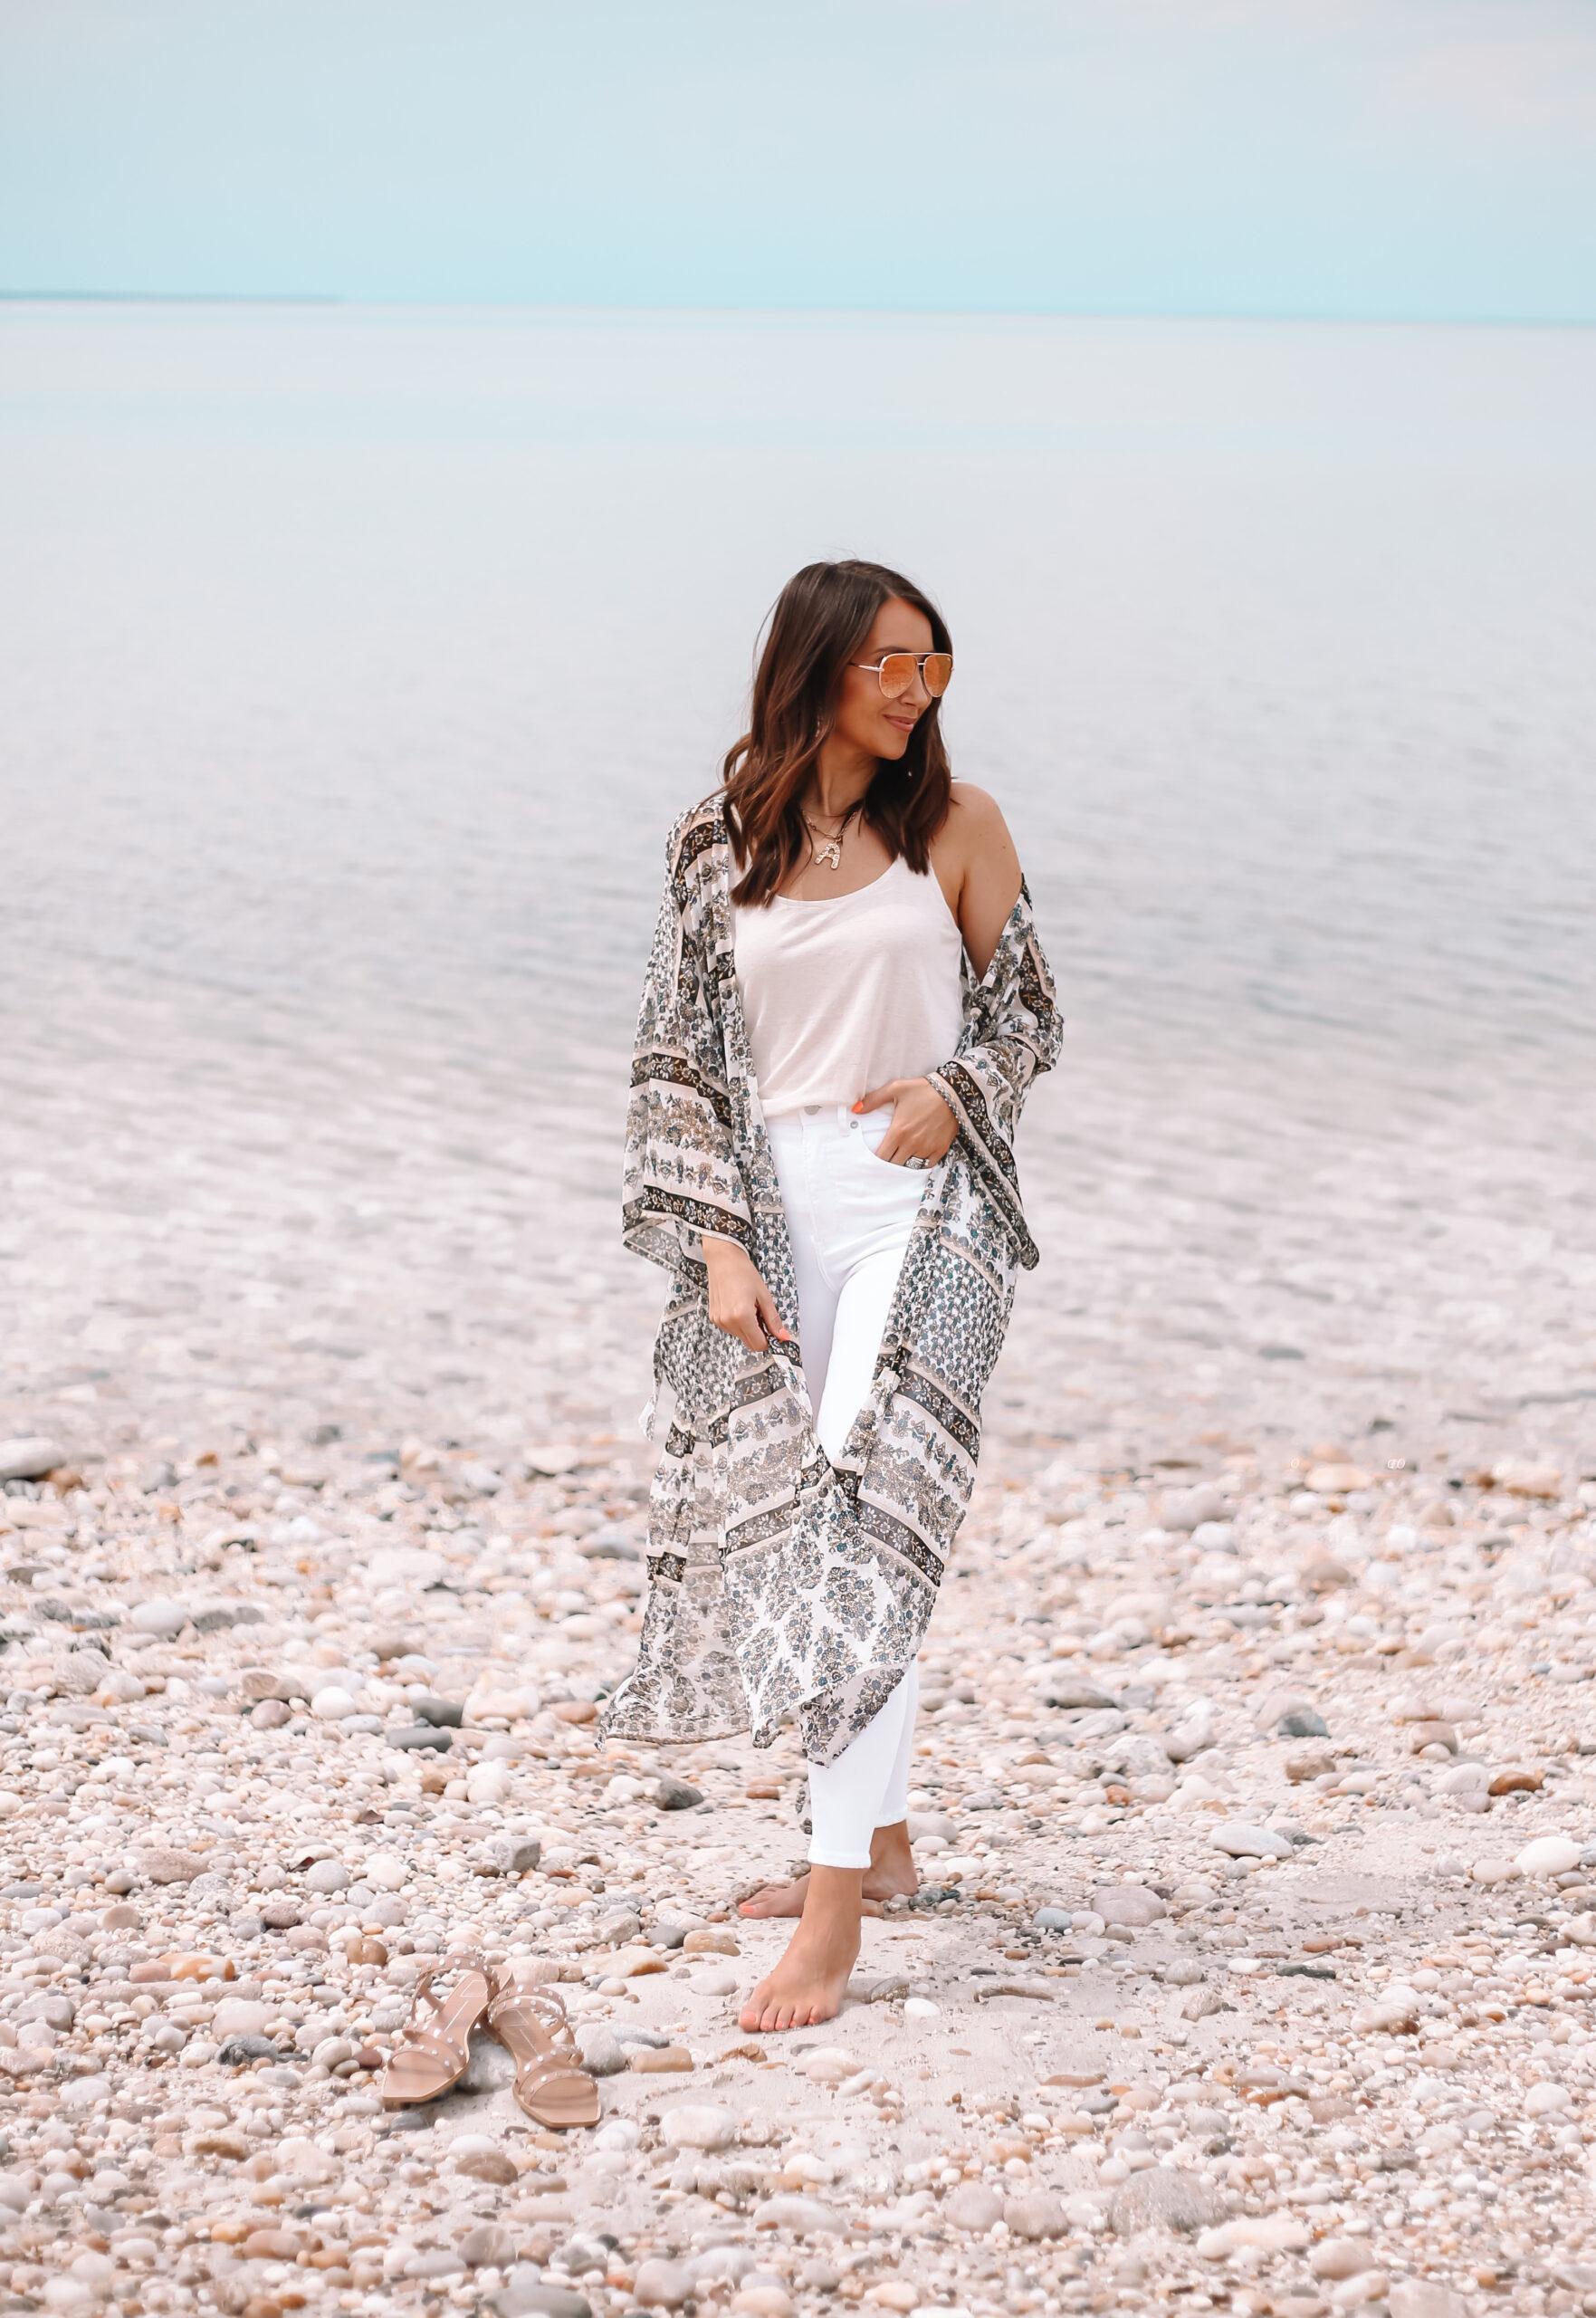 Express kimono, spring outfit with white jeans